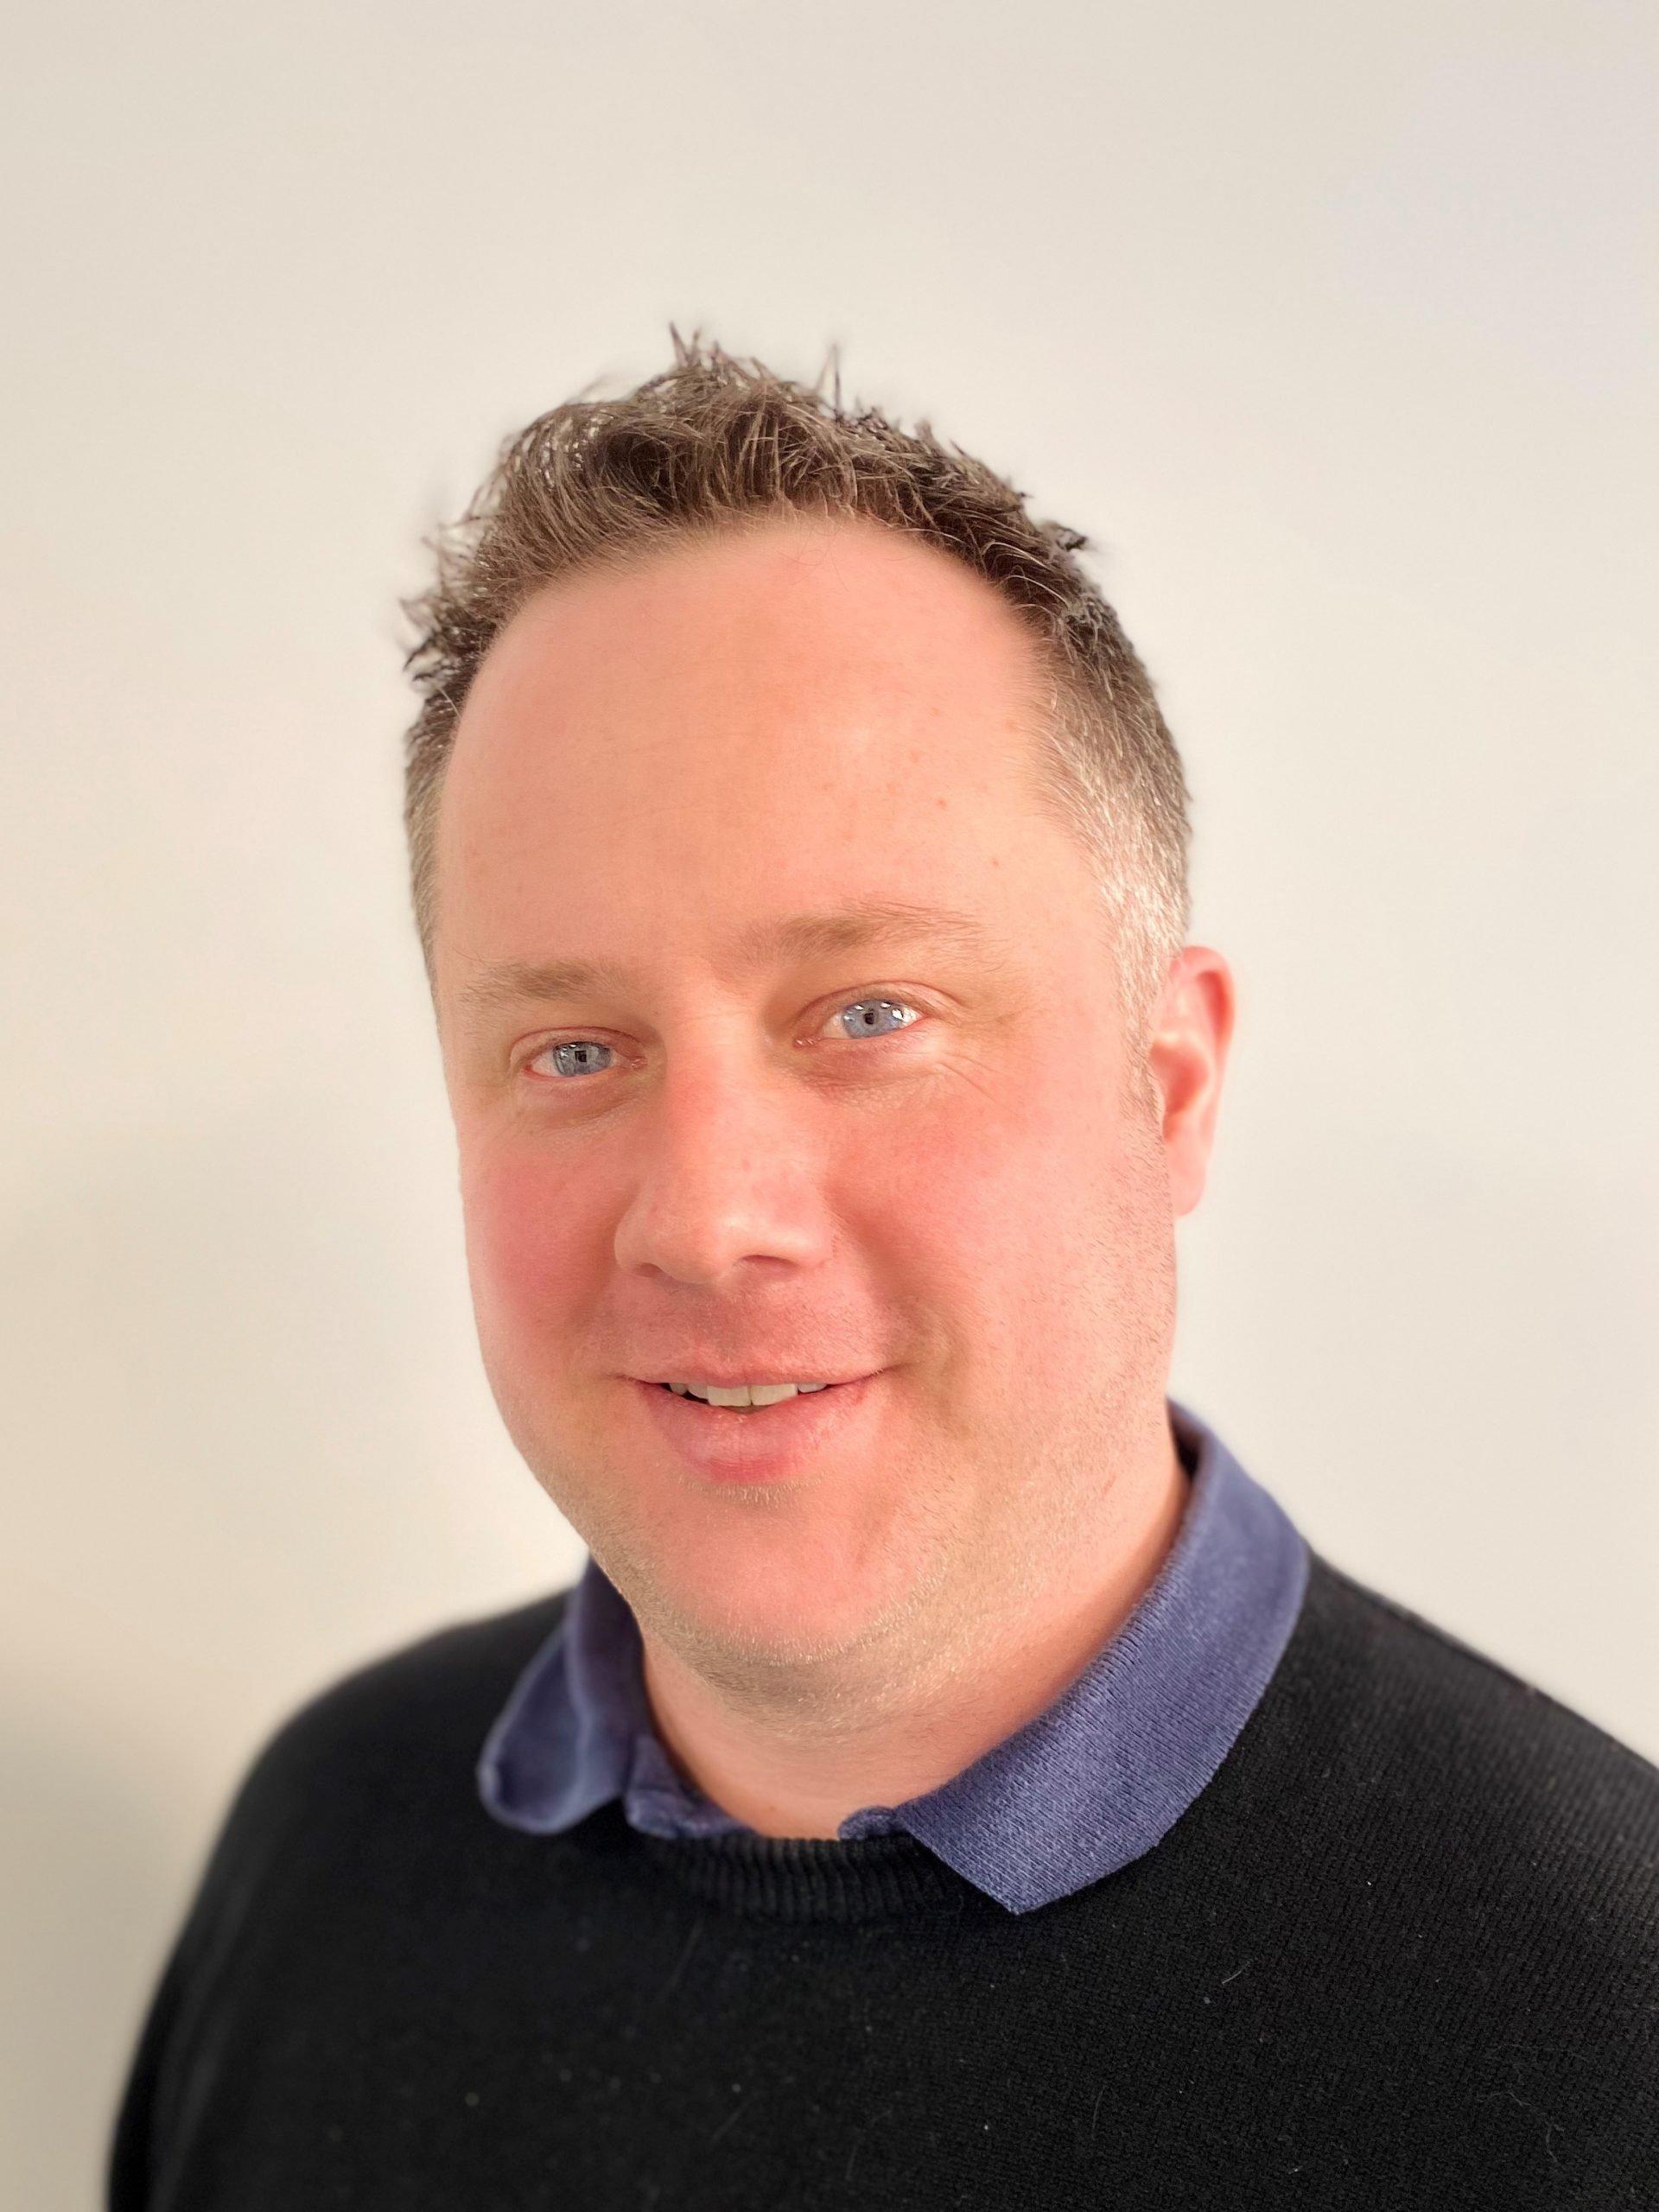 Image of Rob Tedder